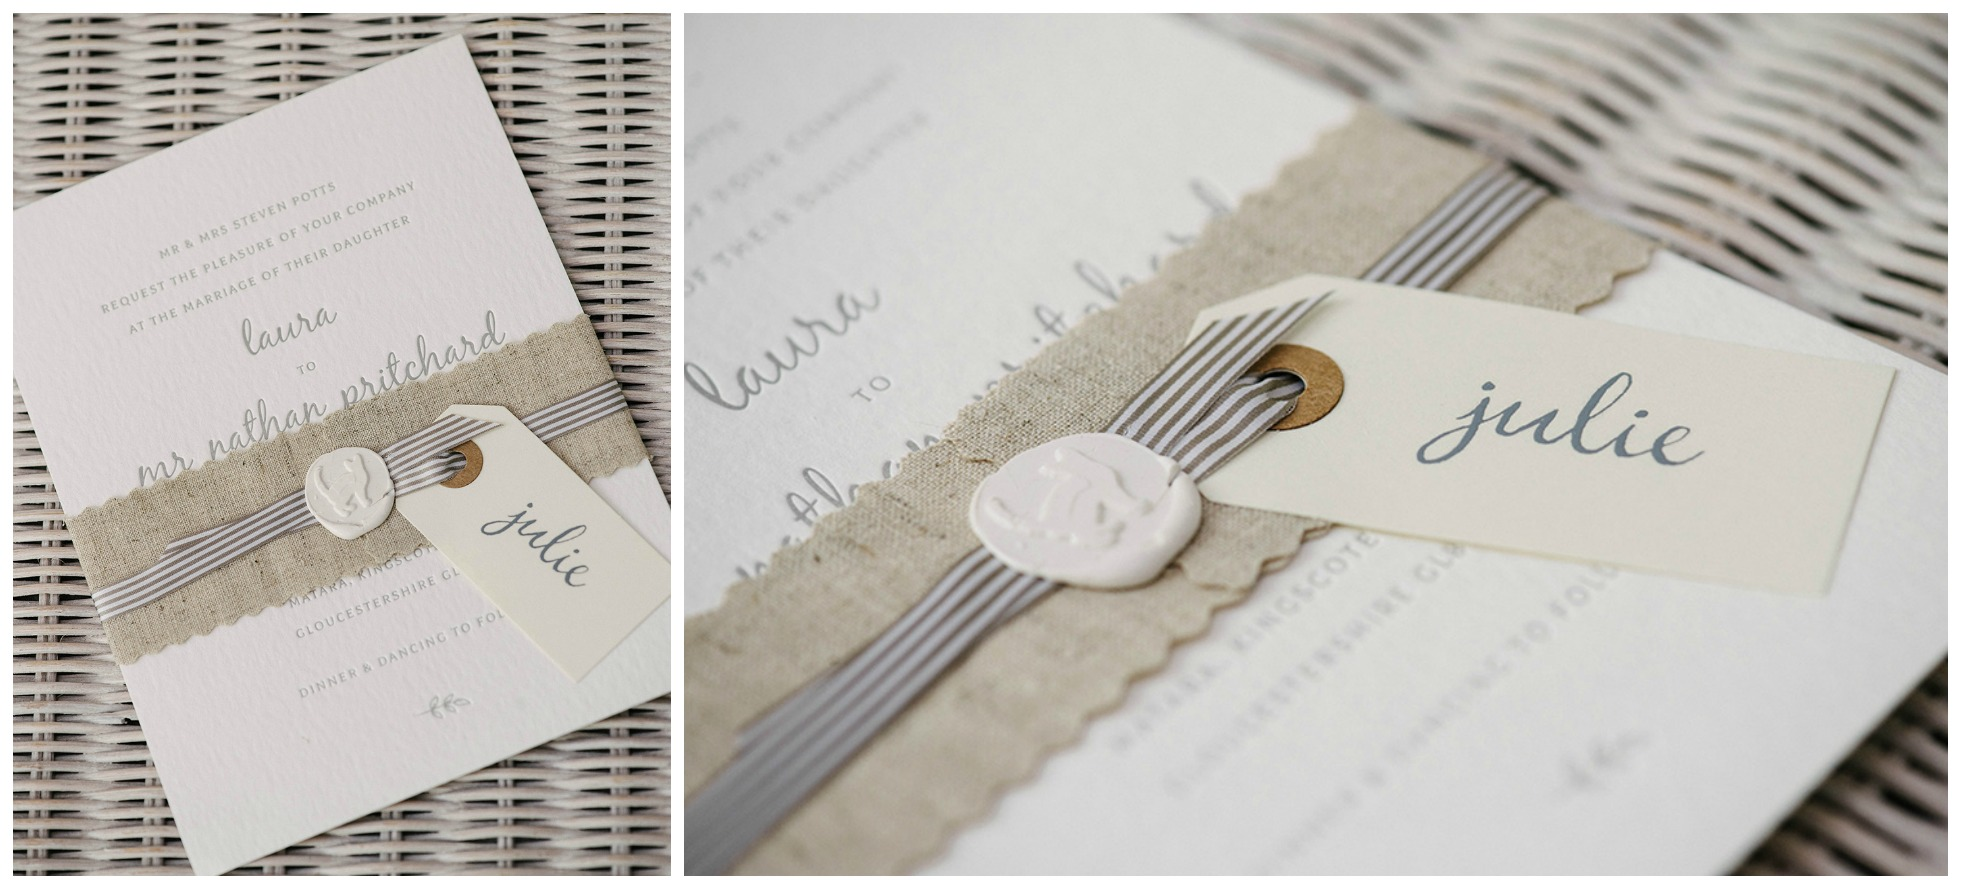 letterpress wedding invitations   Dimple Stitch - The Blog